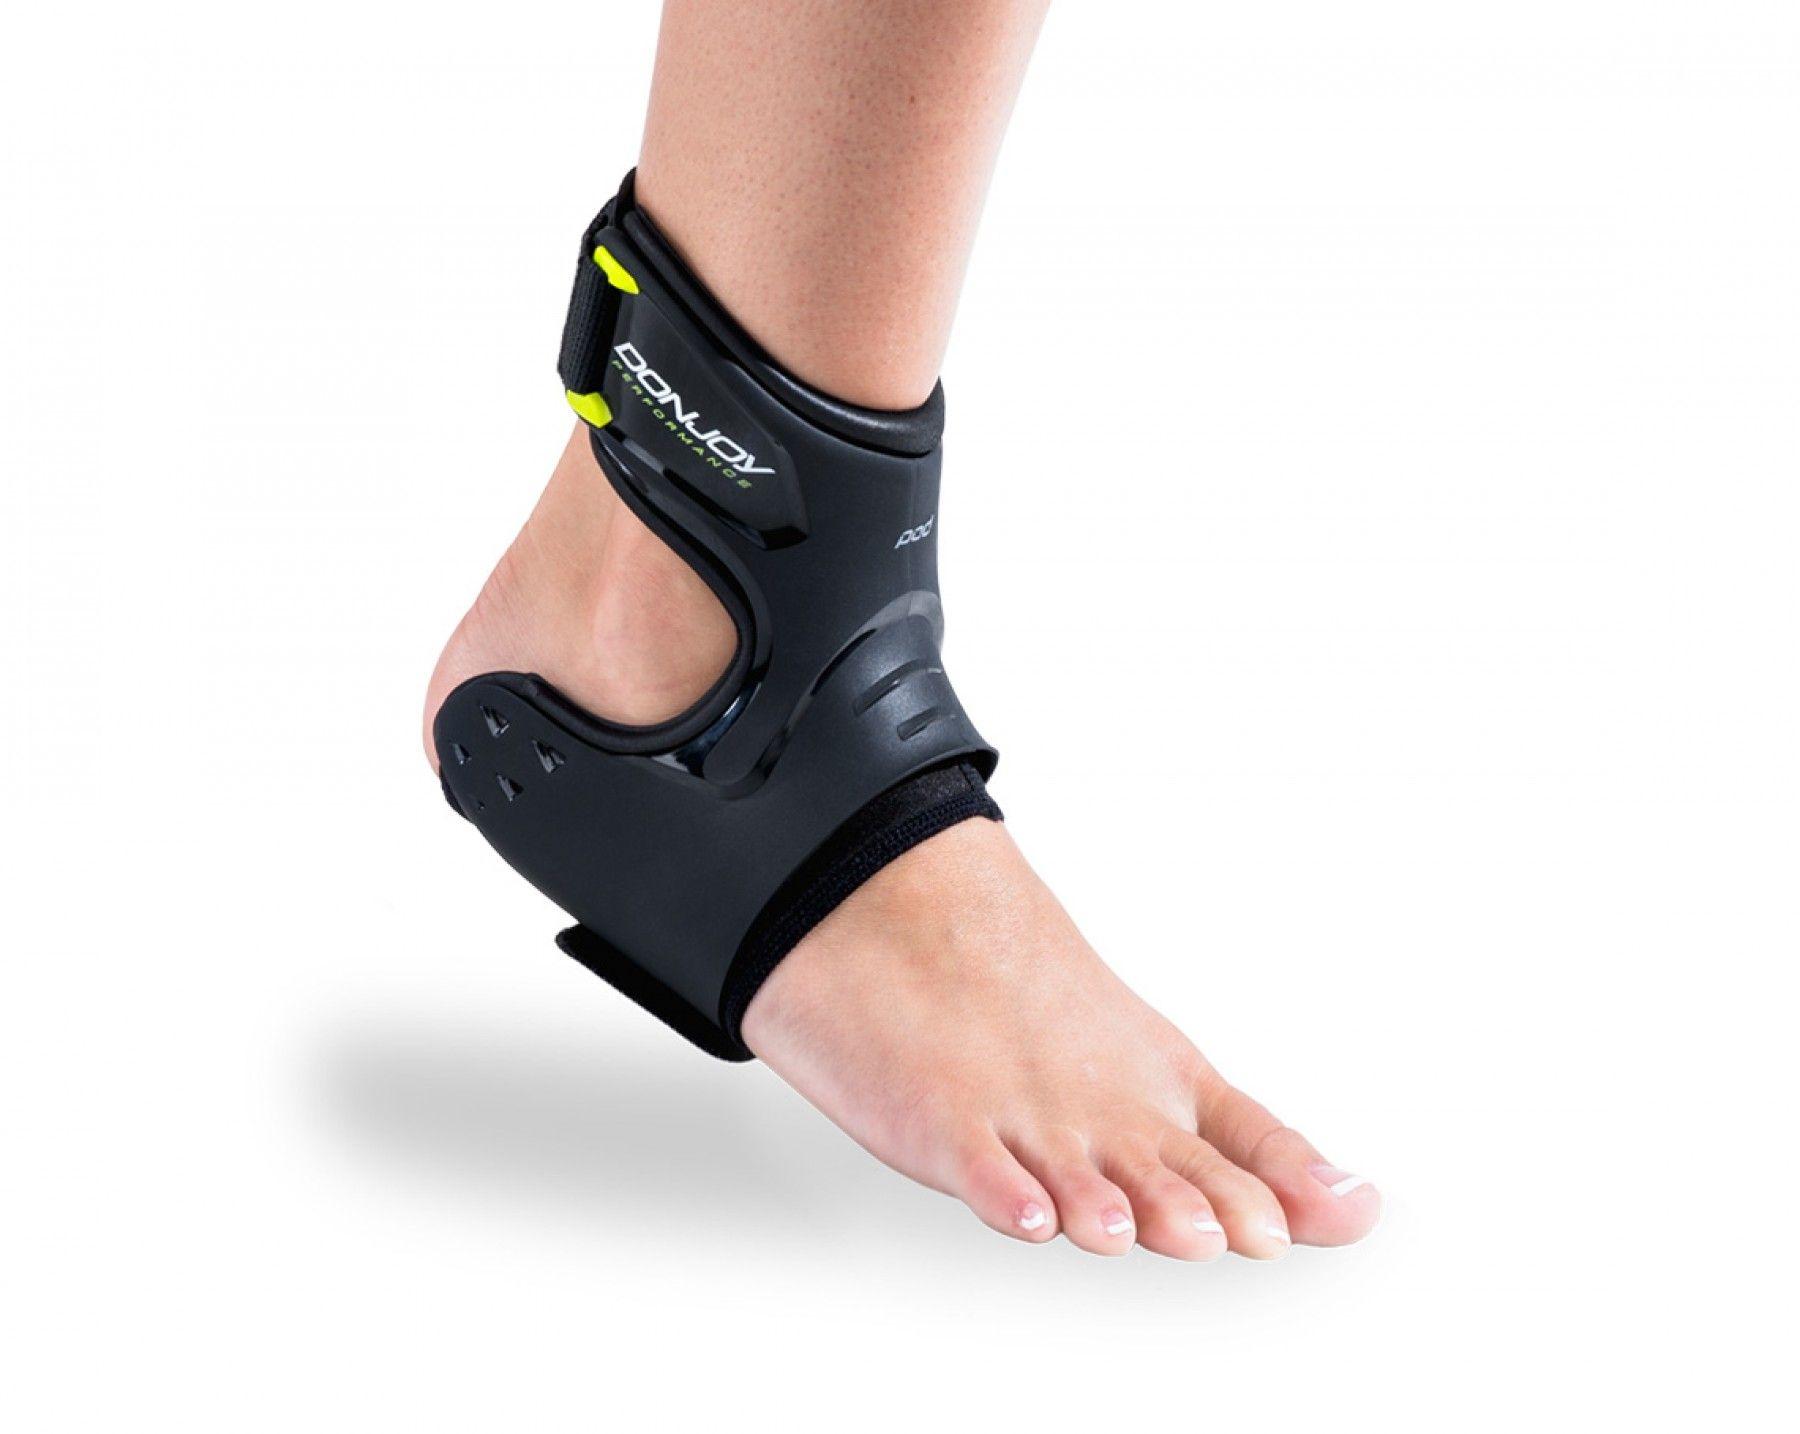 Donjoy Performance Pod Ankle Support Brace Ankle Braces Sprained Ankle Sports Braces